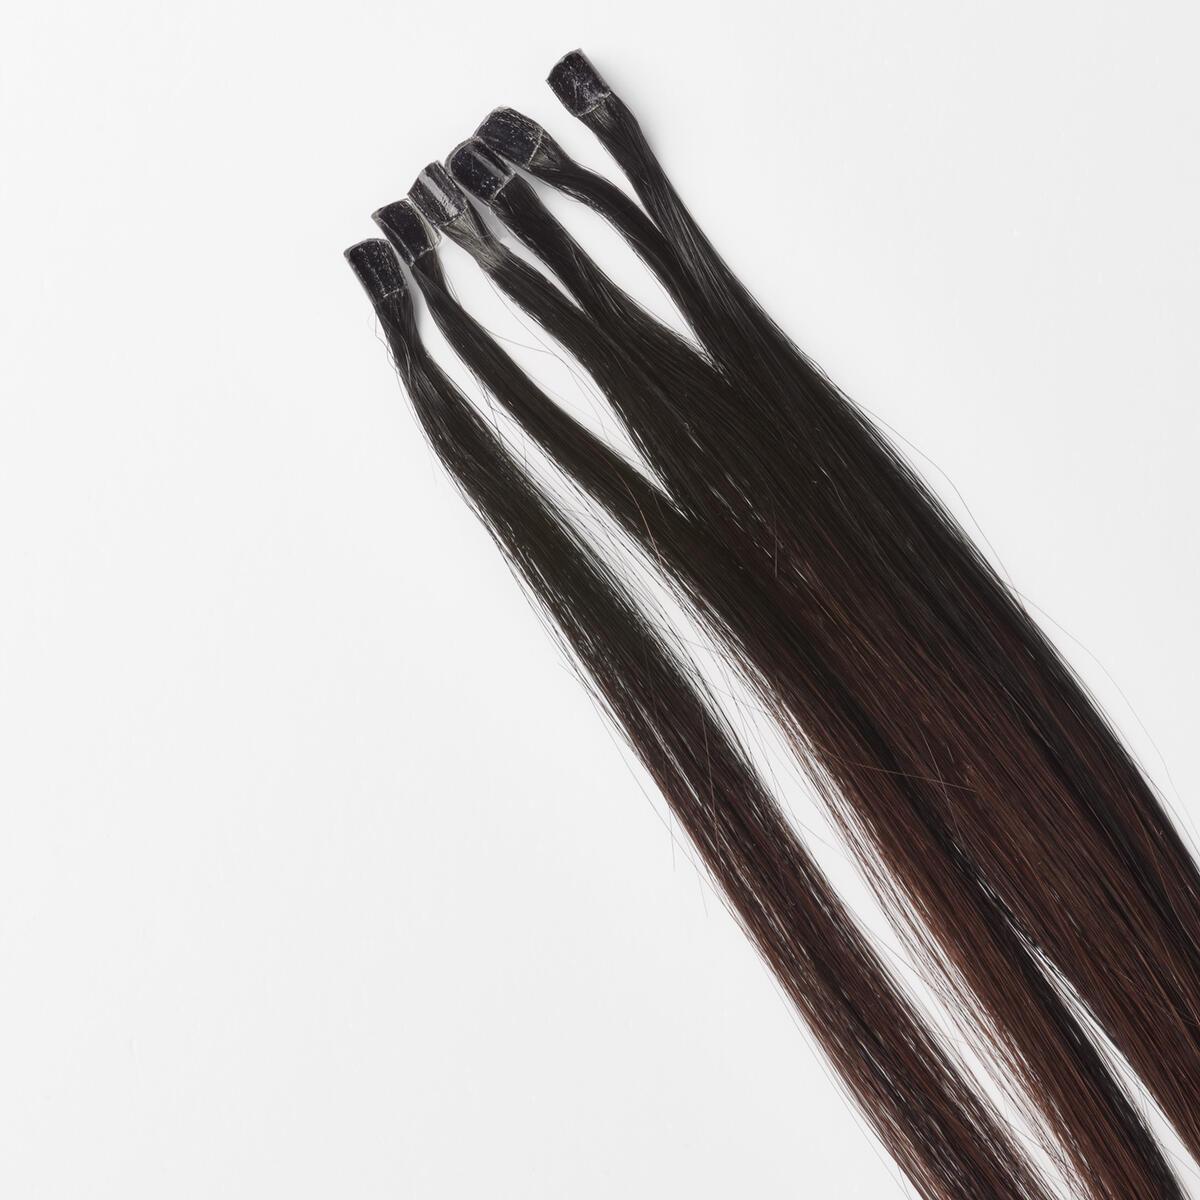 Nail Hair B1.0/6.12 Cherry Infused Black Balayage 50 cm